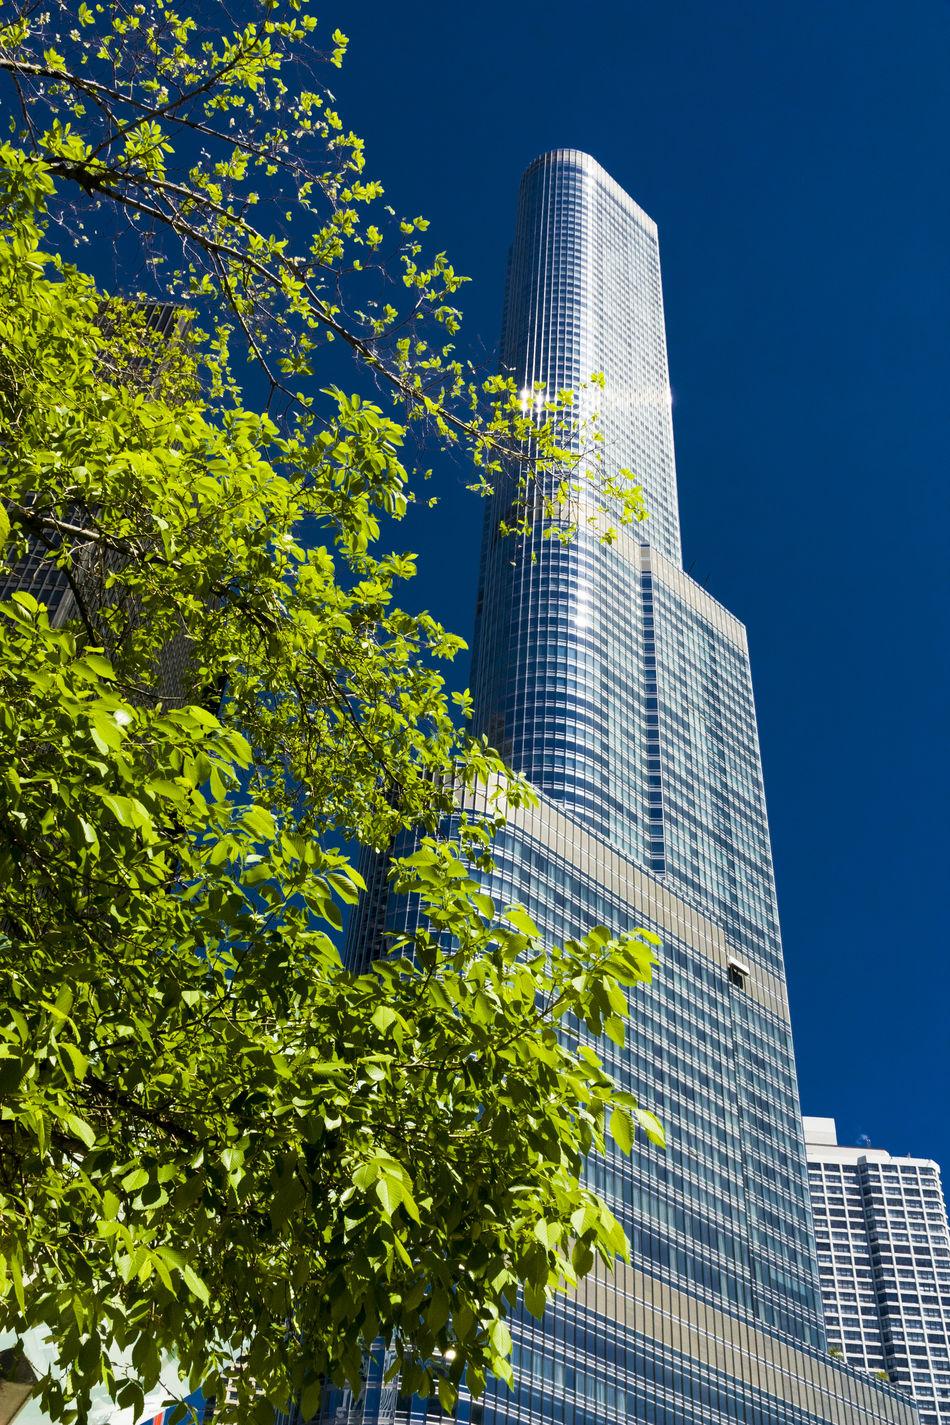 Architecture Chicago Donald Trump Green Sky Springcolors Trump Trump Building Trump Tower